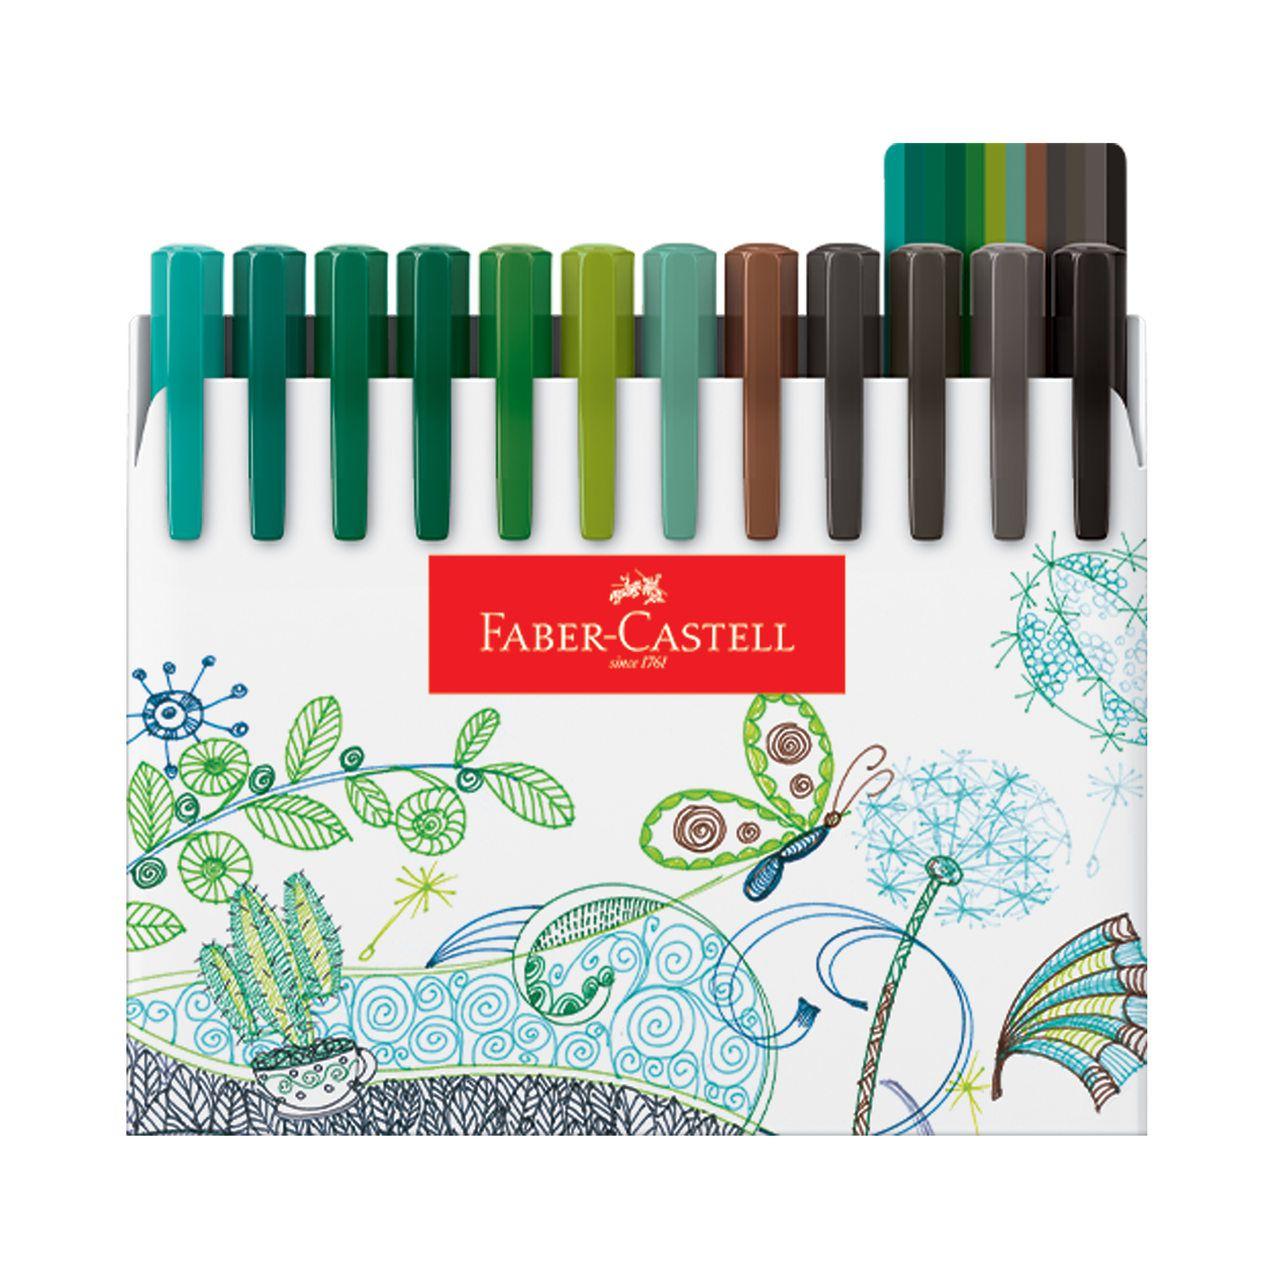 Caneta Hidrográfica 0.4 48 cores FINE PEN Faber-Castell